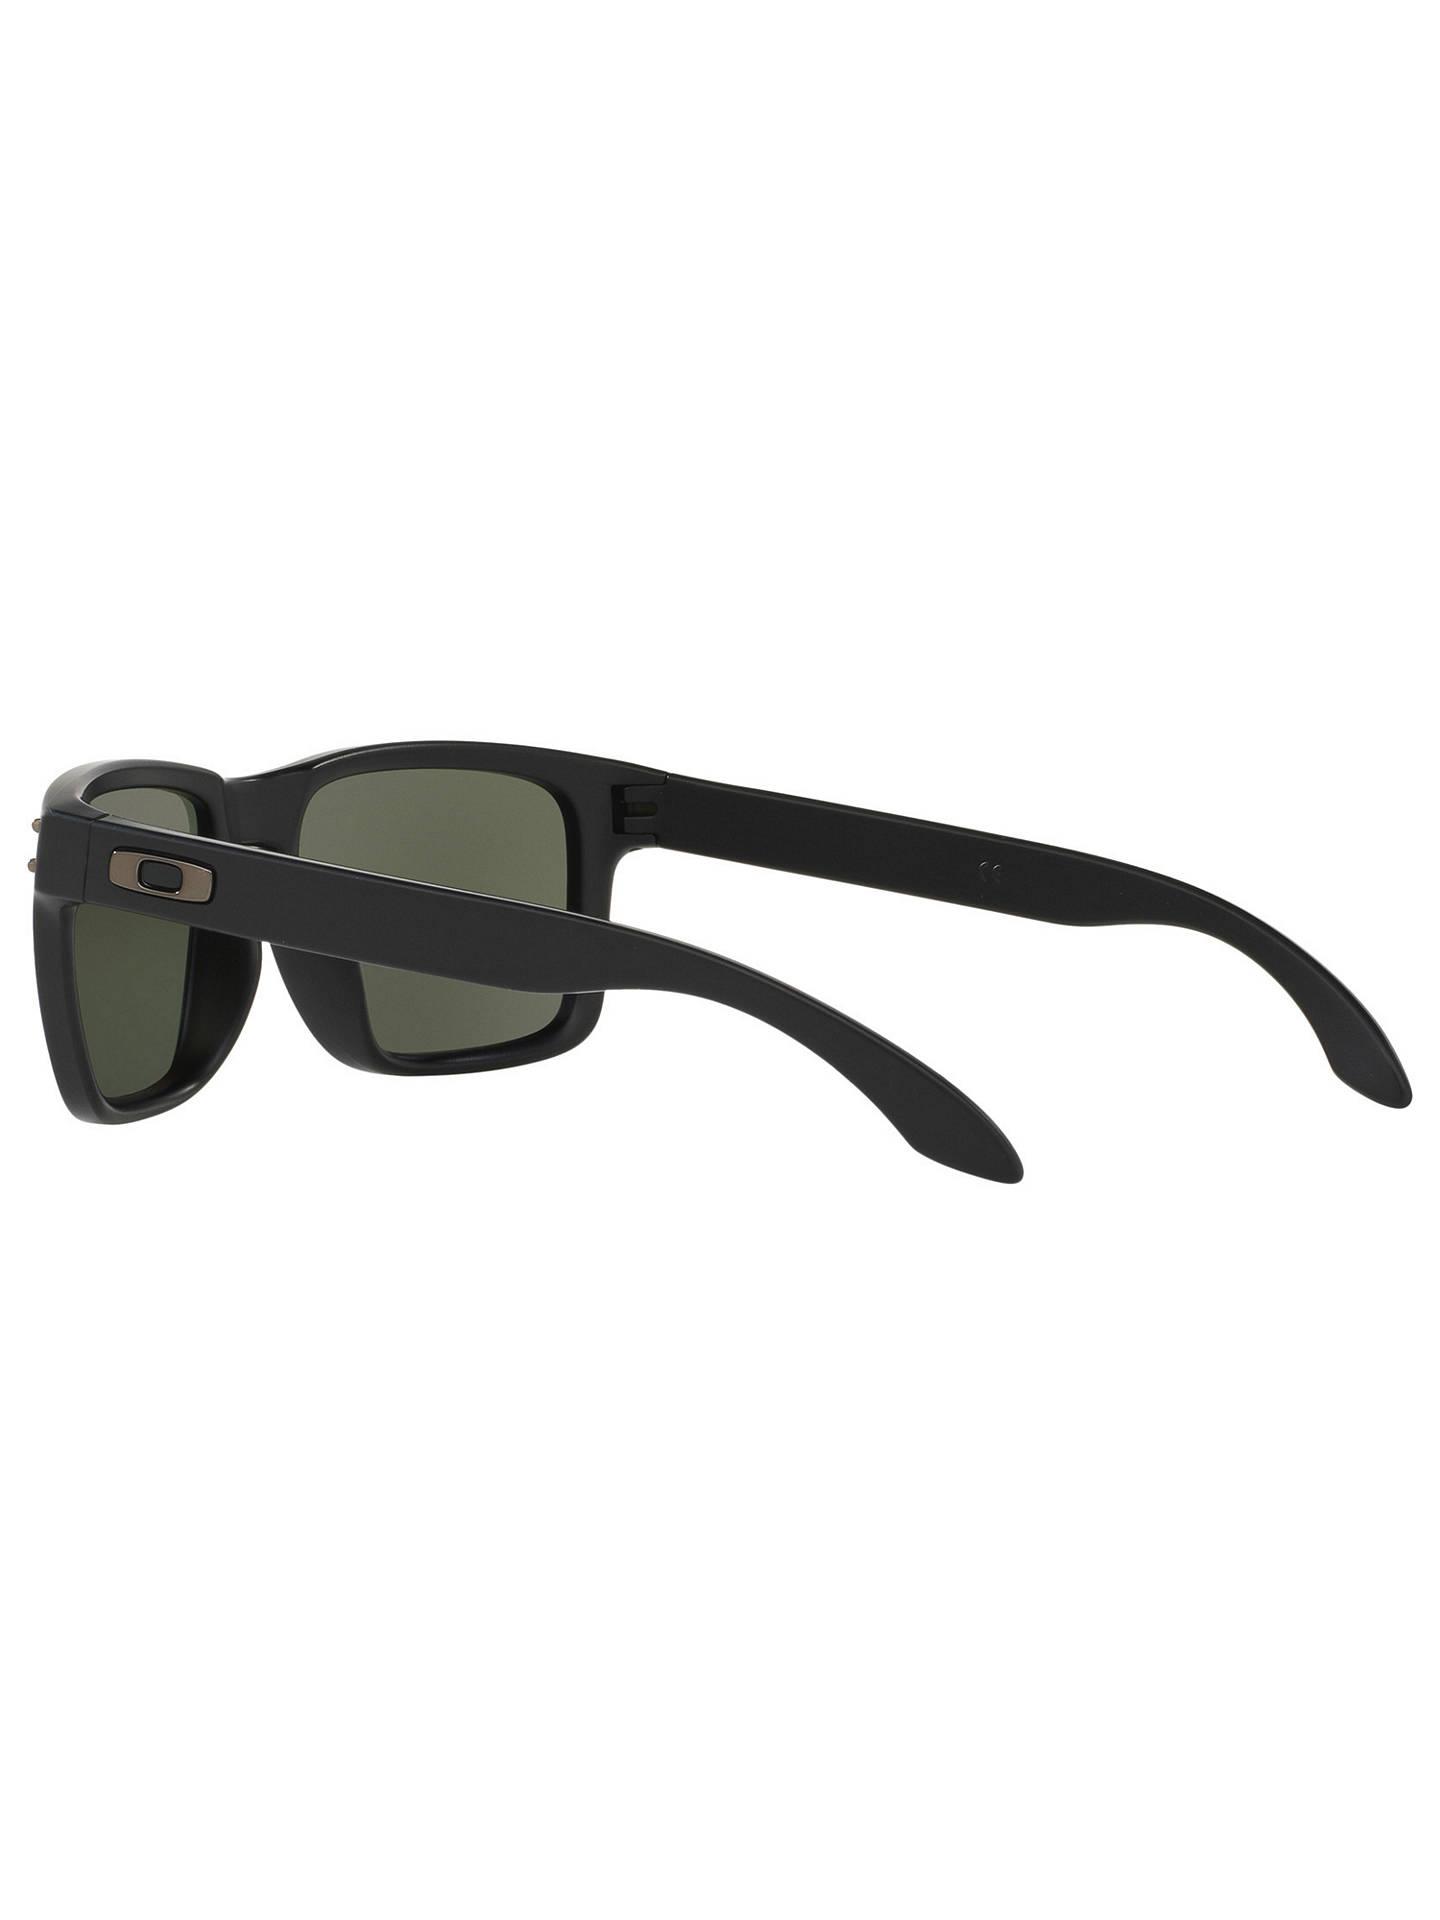 d23f74eed5b5 Oakley OO9102 Holbrook Prizm Polarised Square Sunglasses at John ...